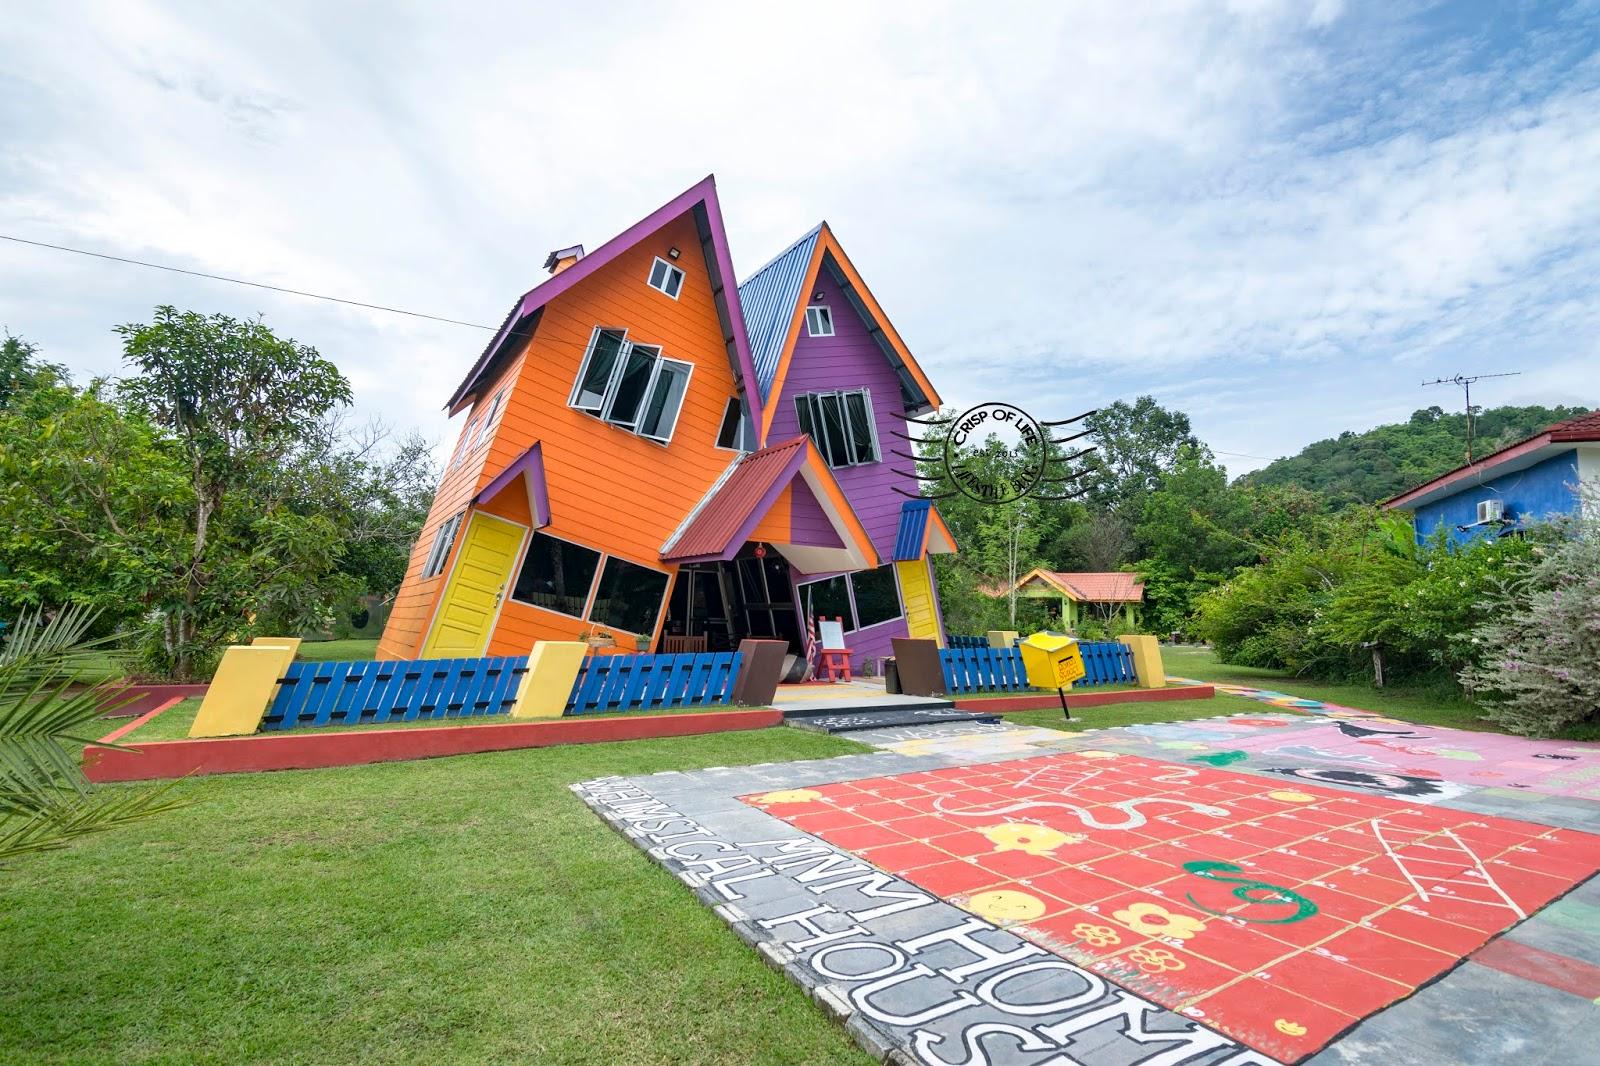 MnM Home Whimsical Houses, Rumah Senget @ Changlun, Kedah